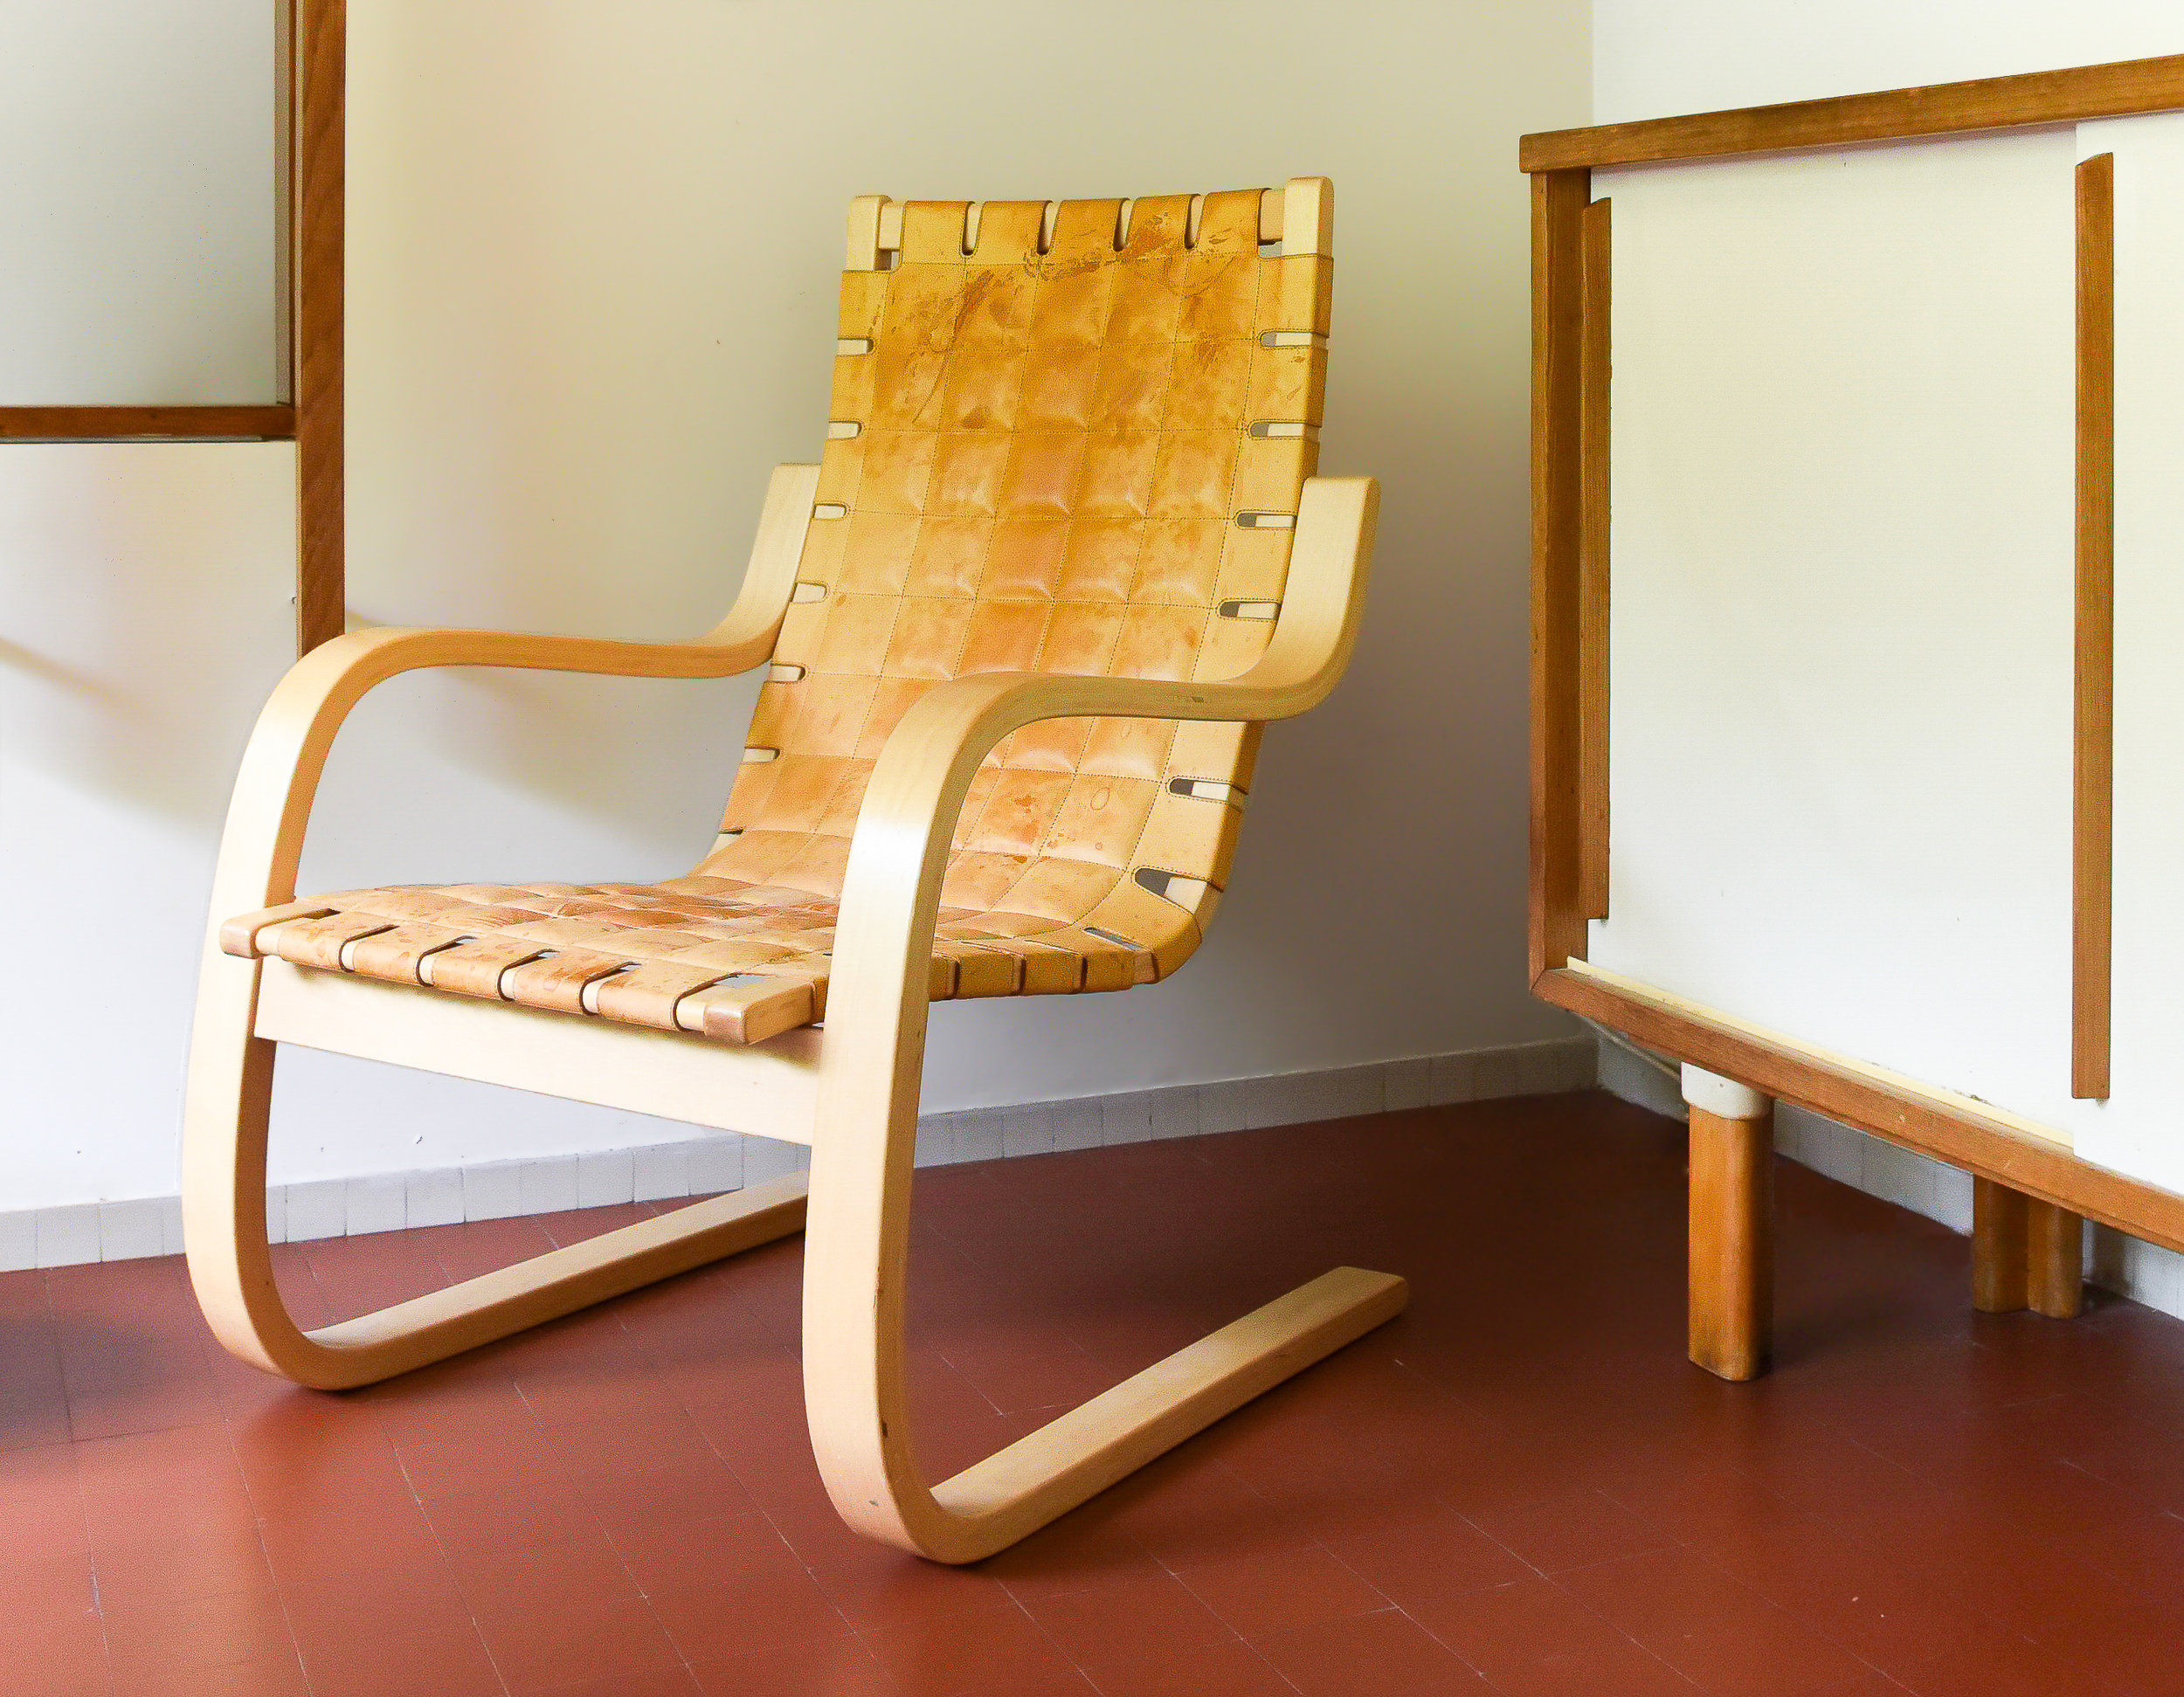 AALTO EARLY CANTILEVER CHAIR,  artek 406 chair.